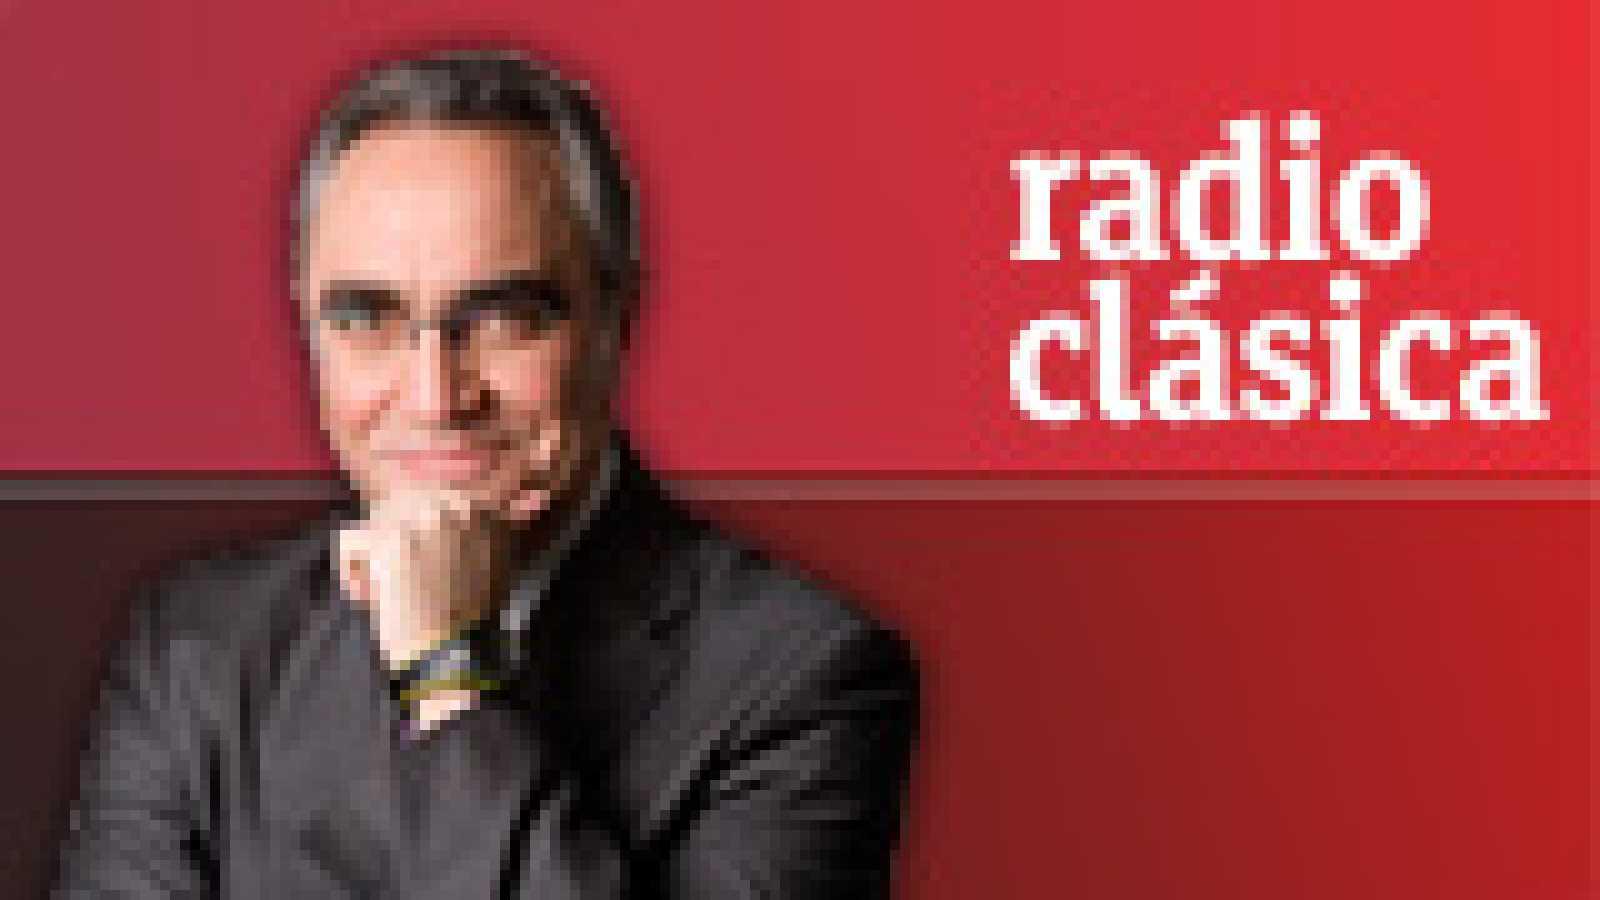 Álbum de discos - Charlie Siem interpreta a Max Bruch - 28/04/12 - Escuchar ahora